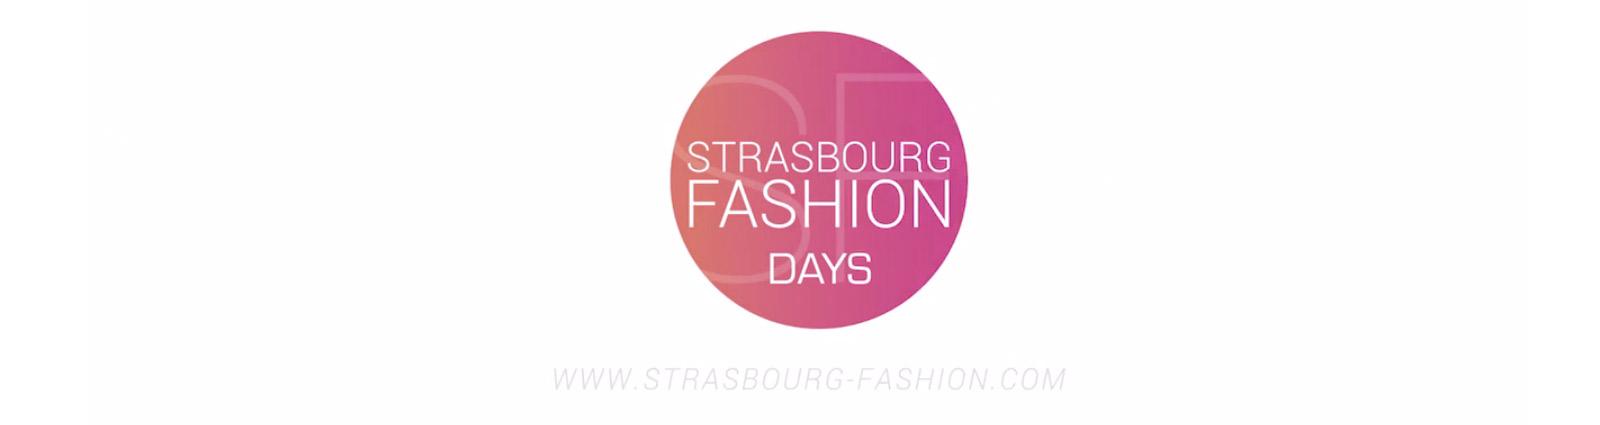 strasbourg fashion days